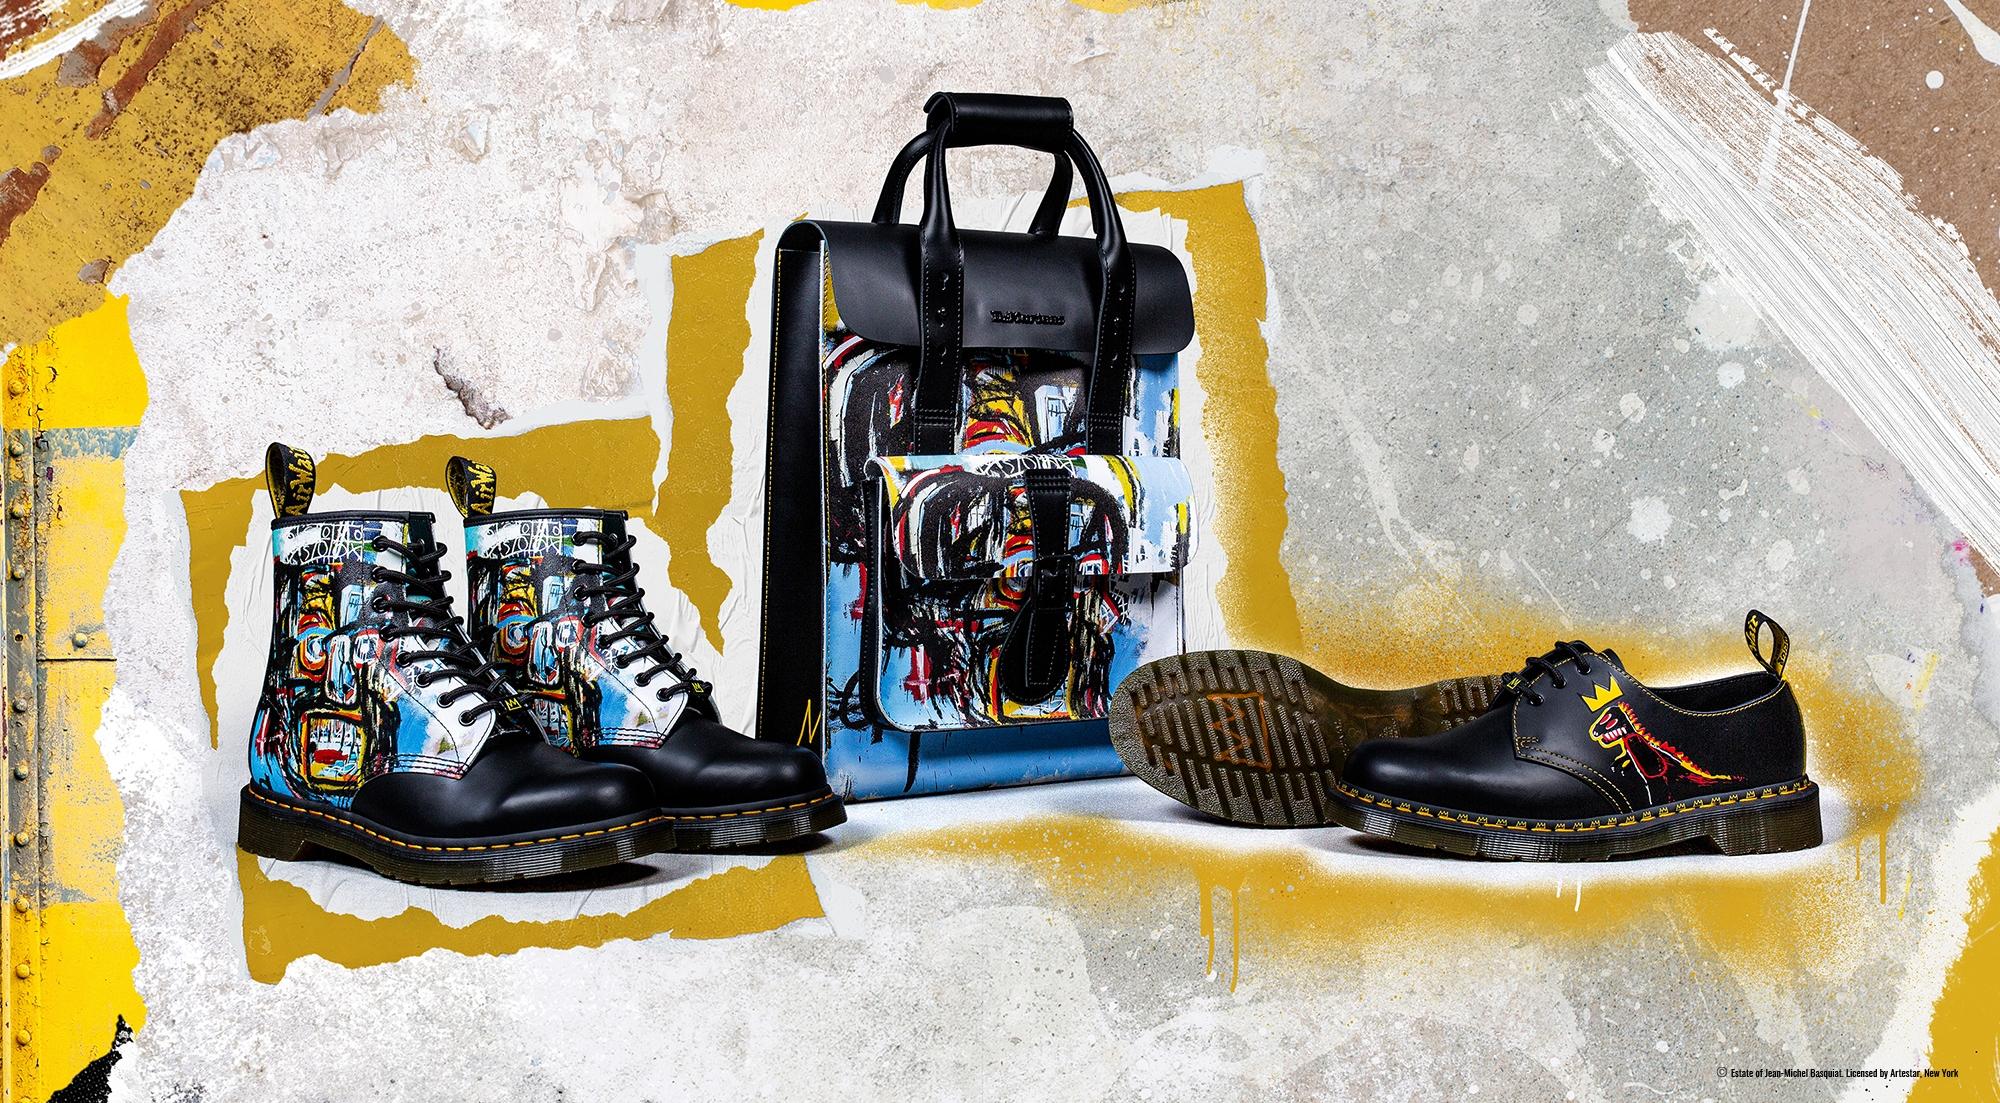 Dr.Martens 再度联合 Jean-Michel Basquiat 带来新鞋款